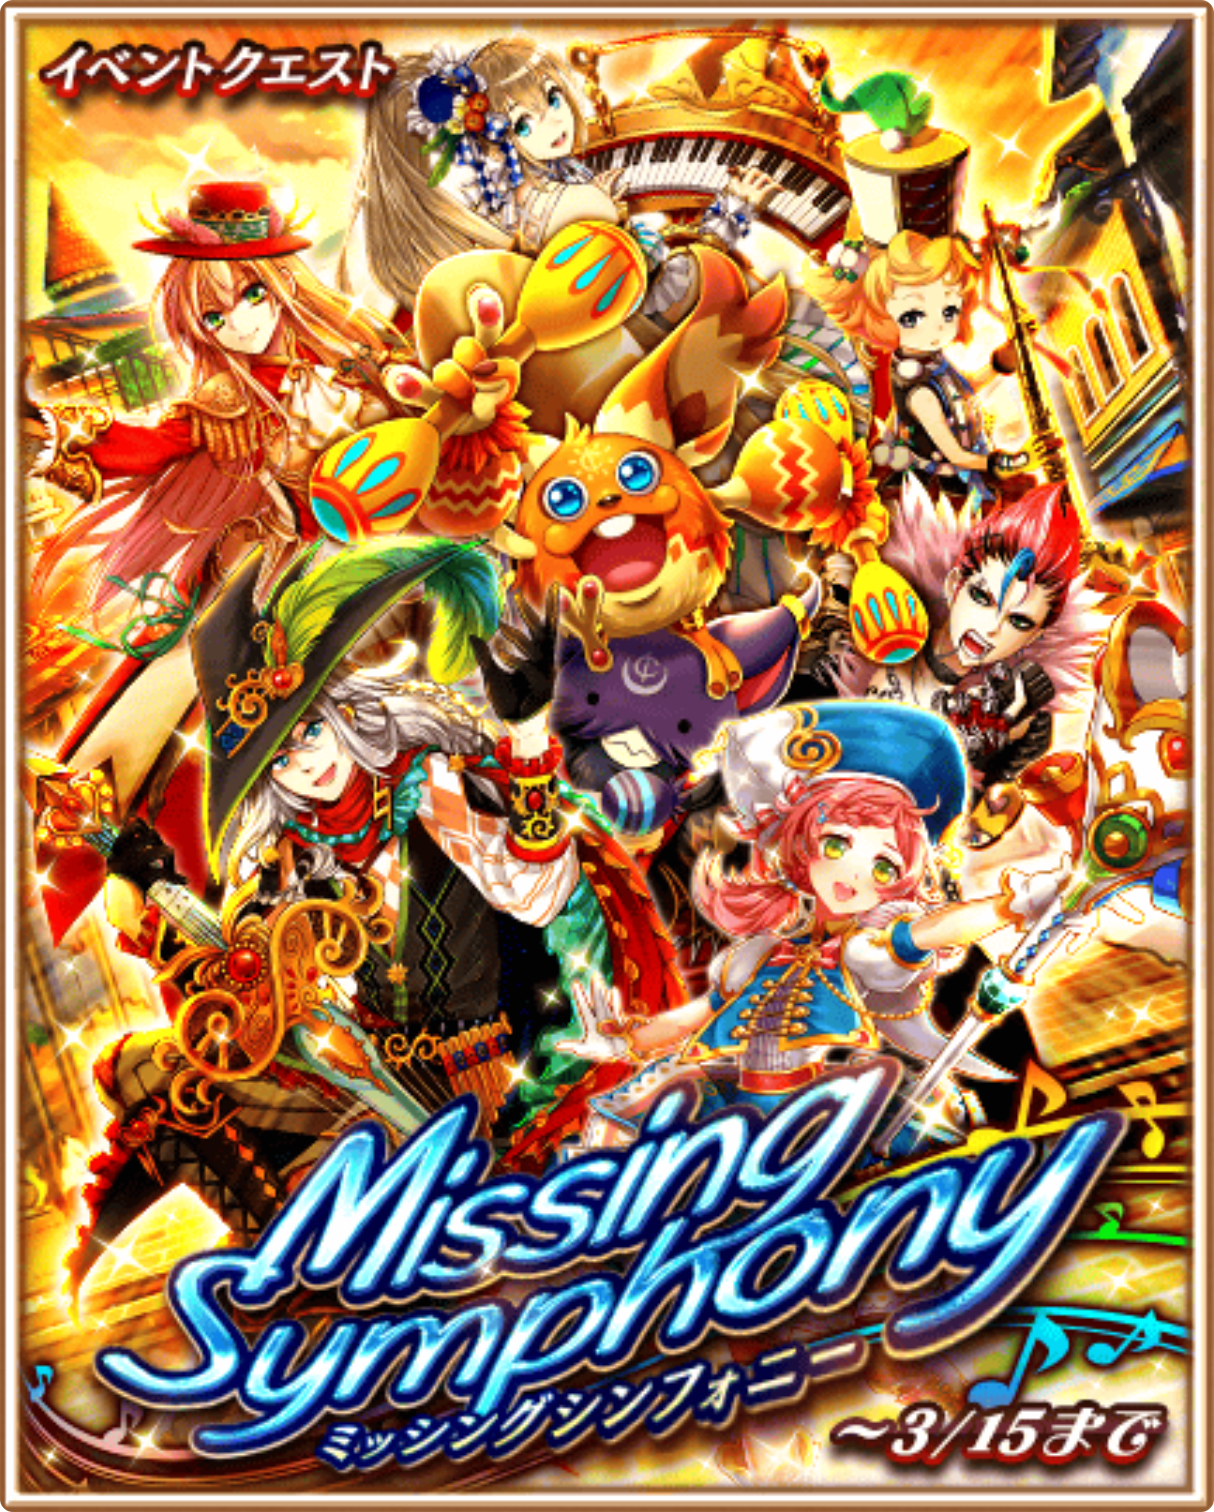 Missing Symphony